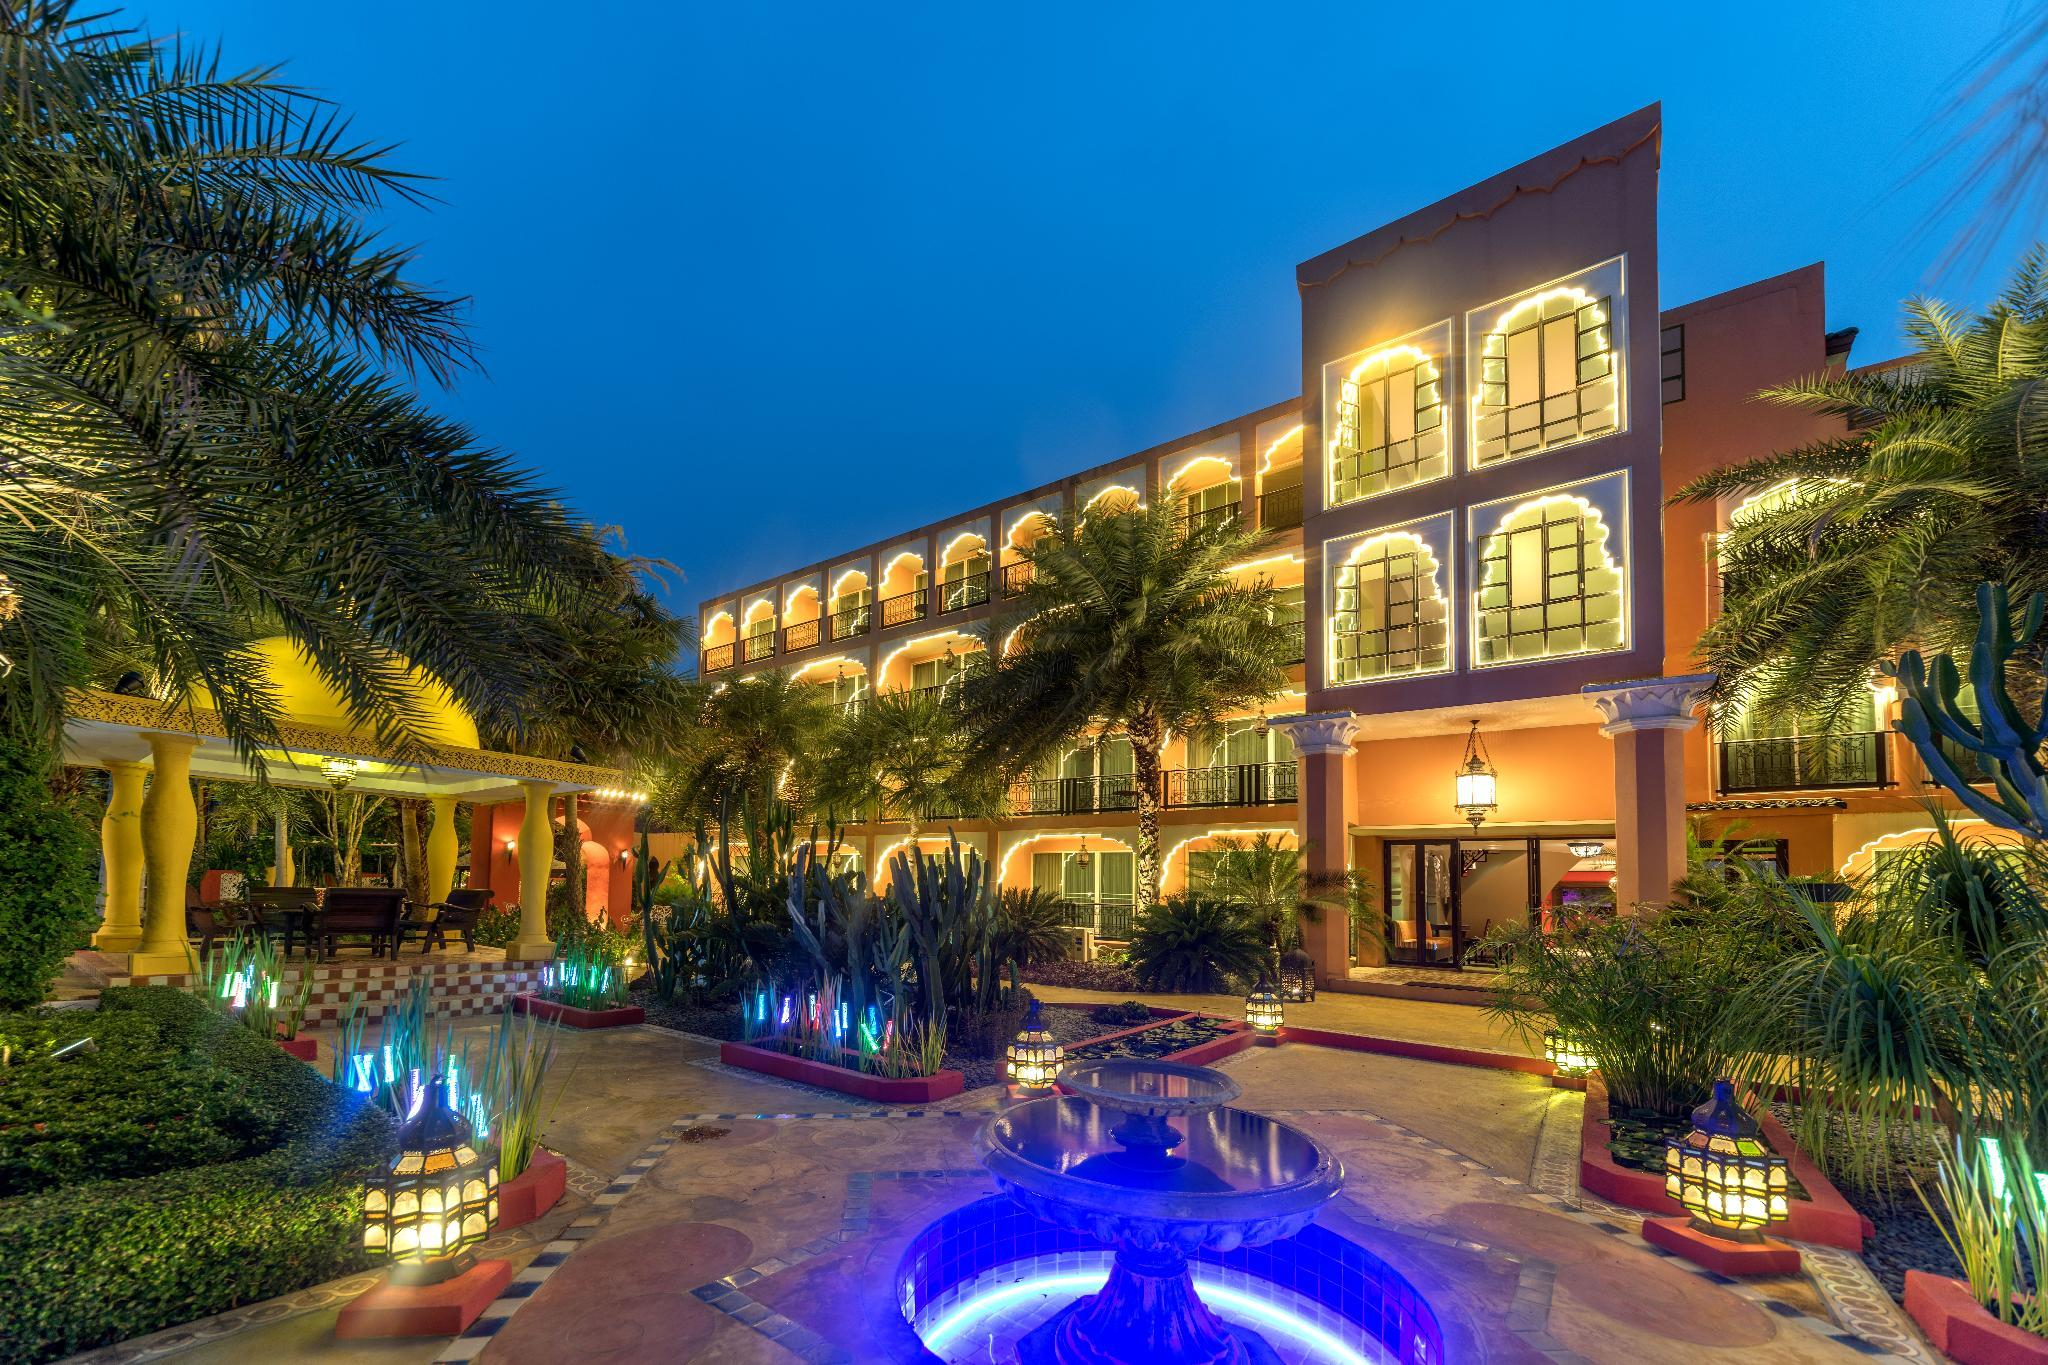 Floral Hotel Sheik Istana Chiangmai